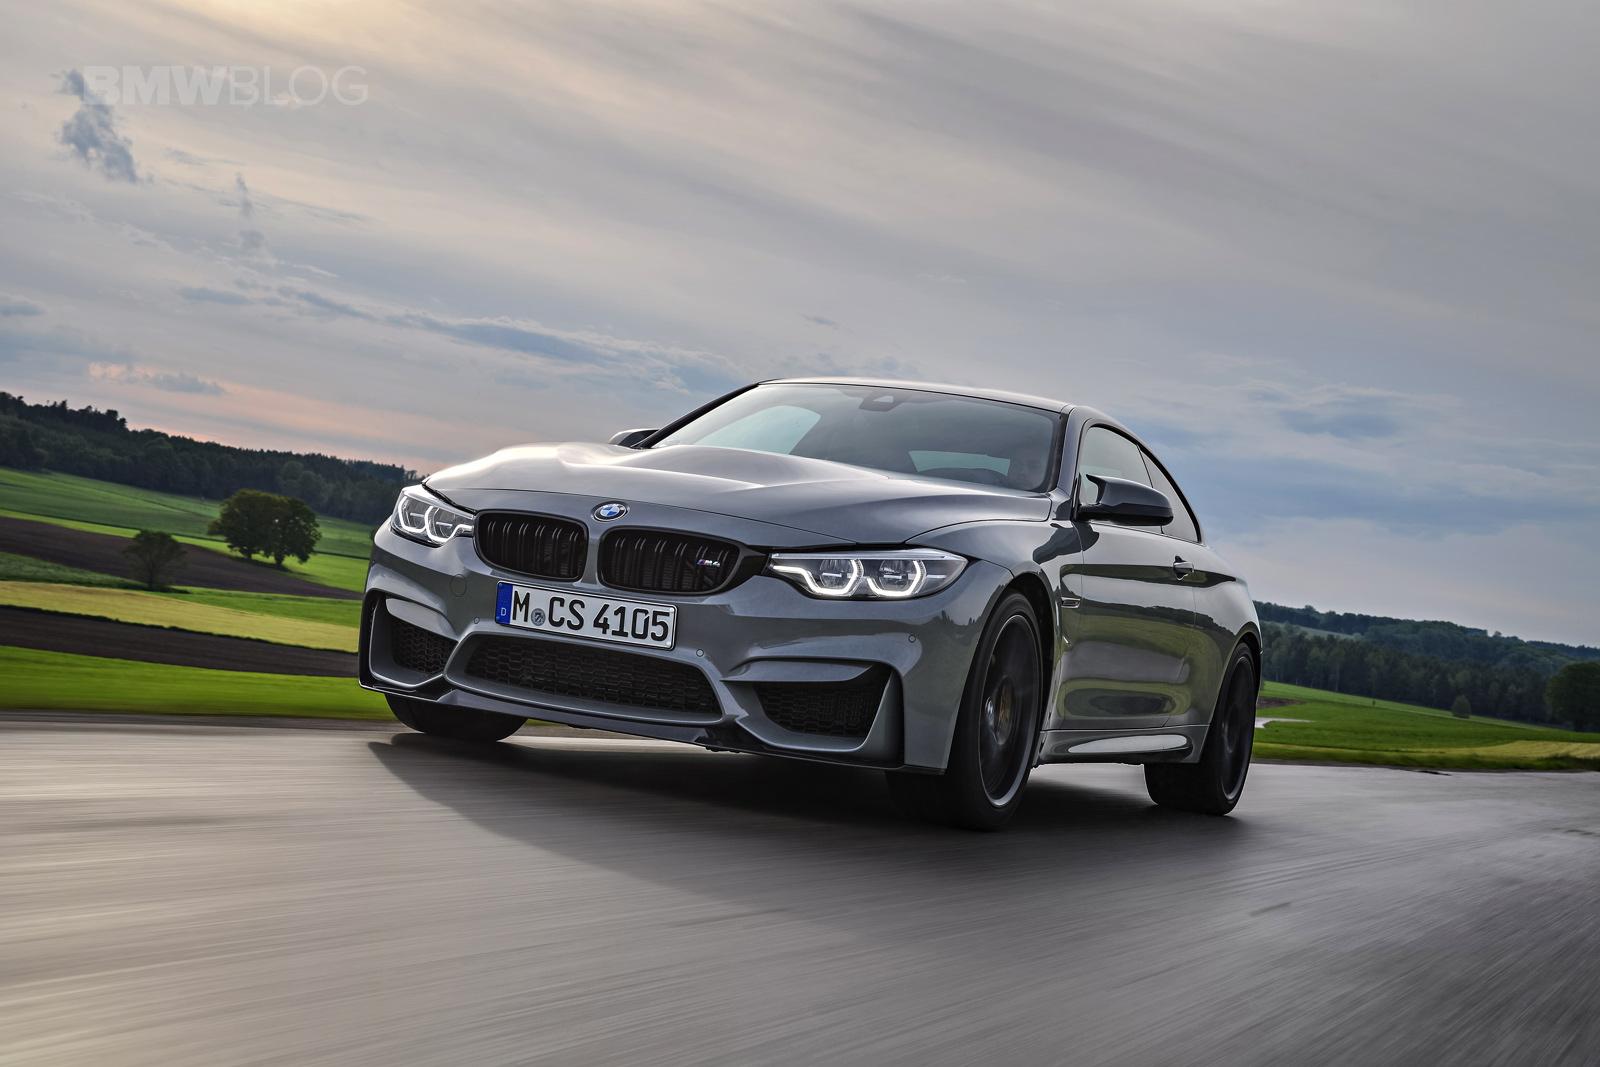 BMW M4 CS LIME ROCK GREY 19